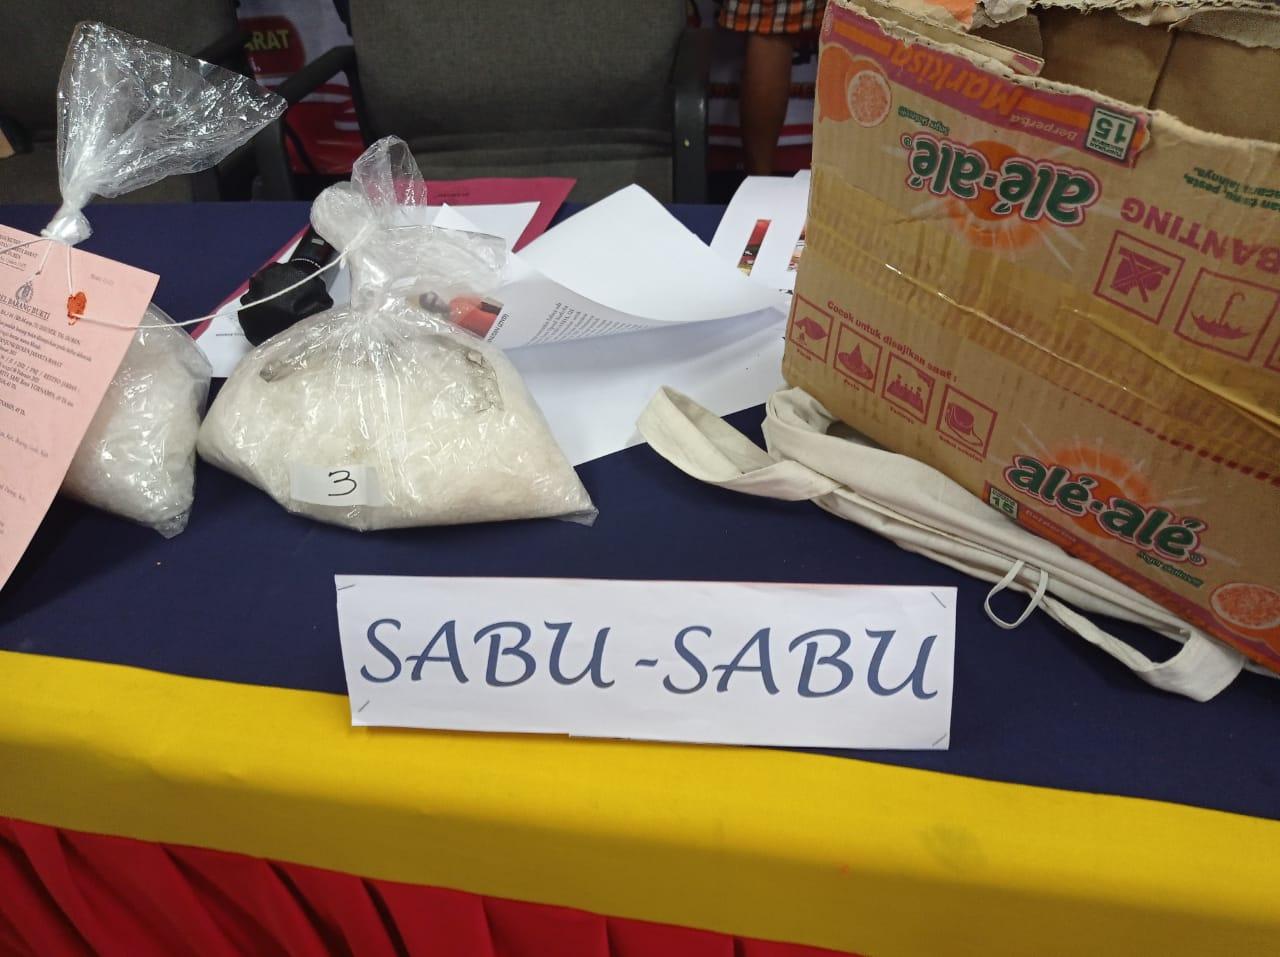 Barang bukti sabu yang diamankan polisi. (Foto: PMJ News)